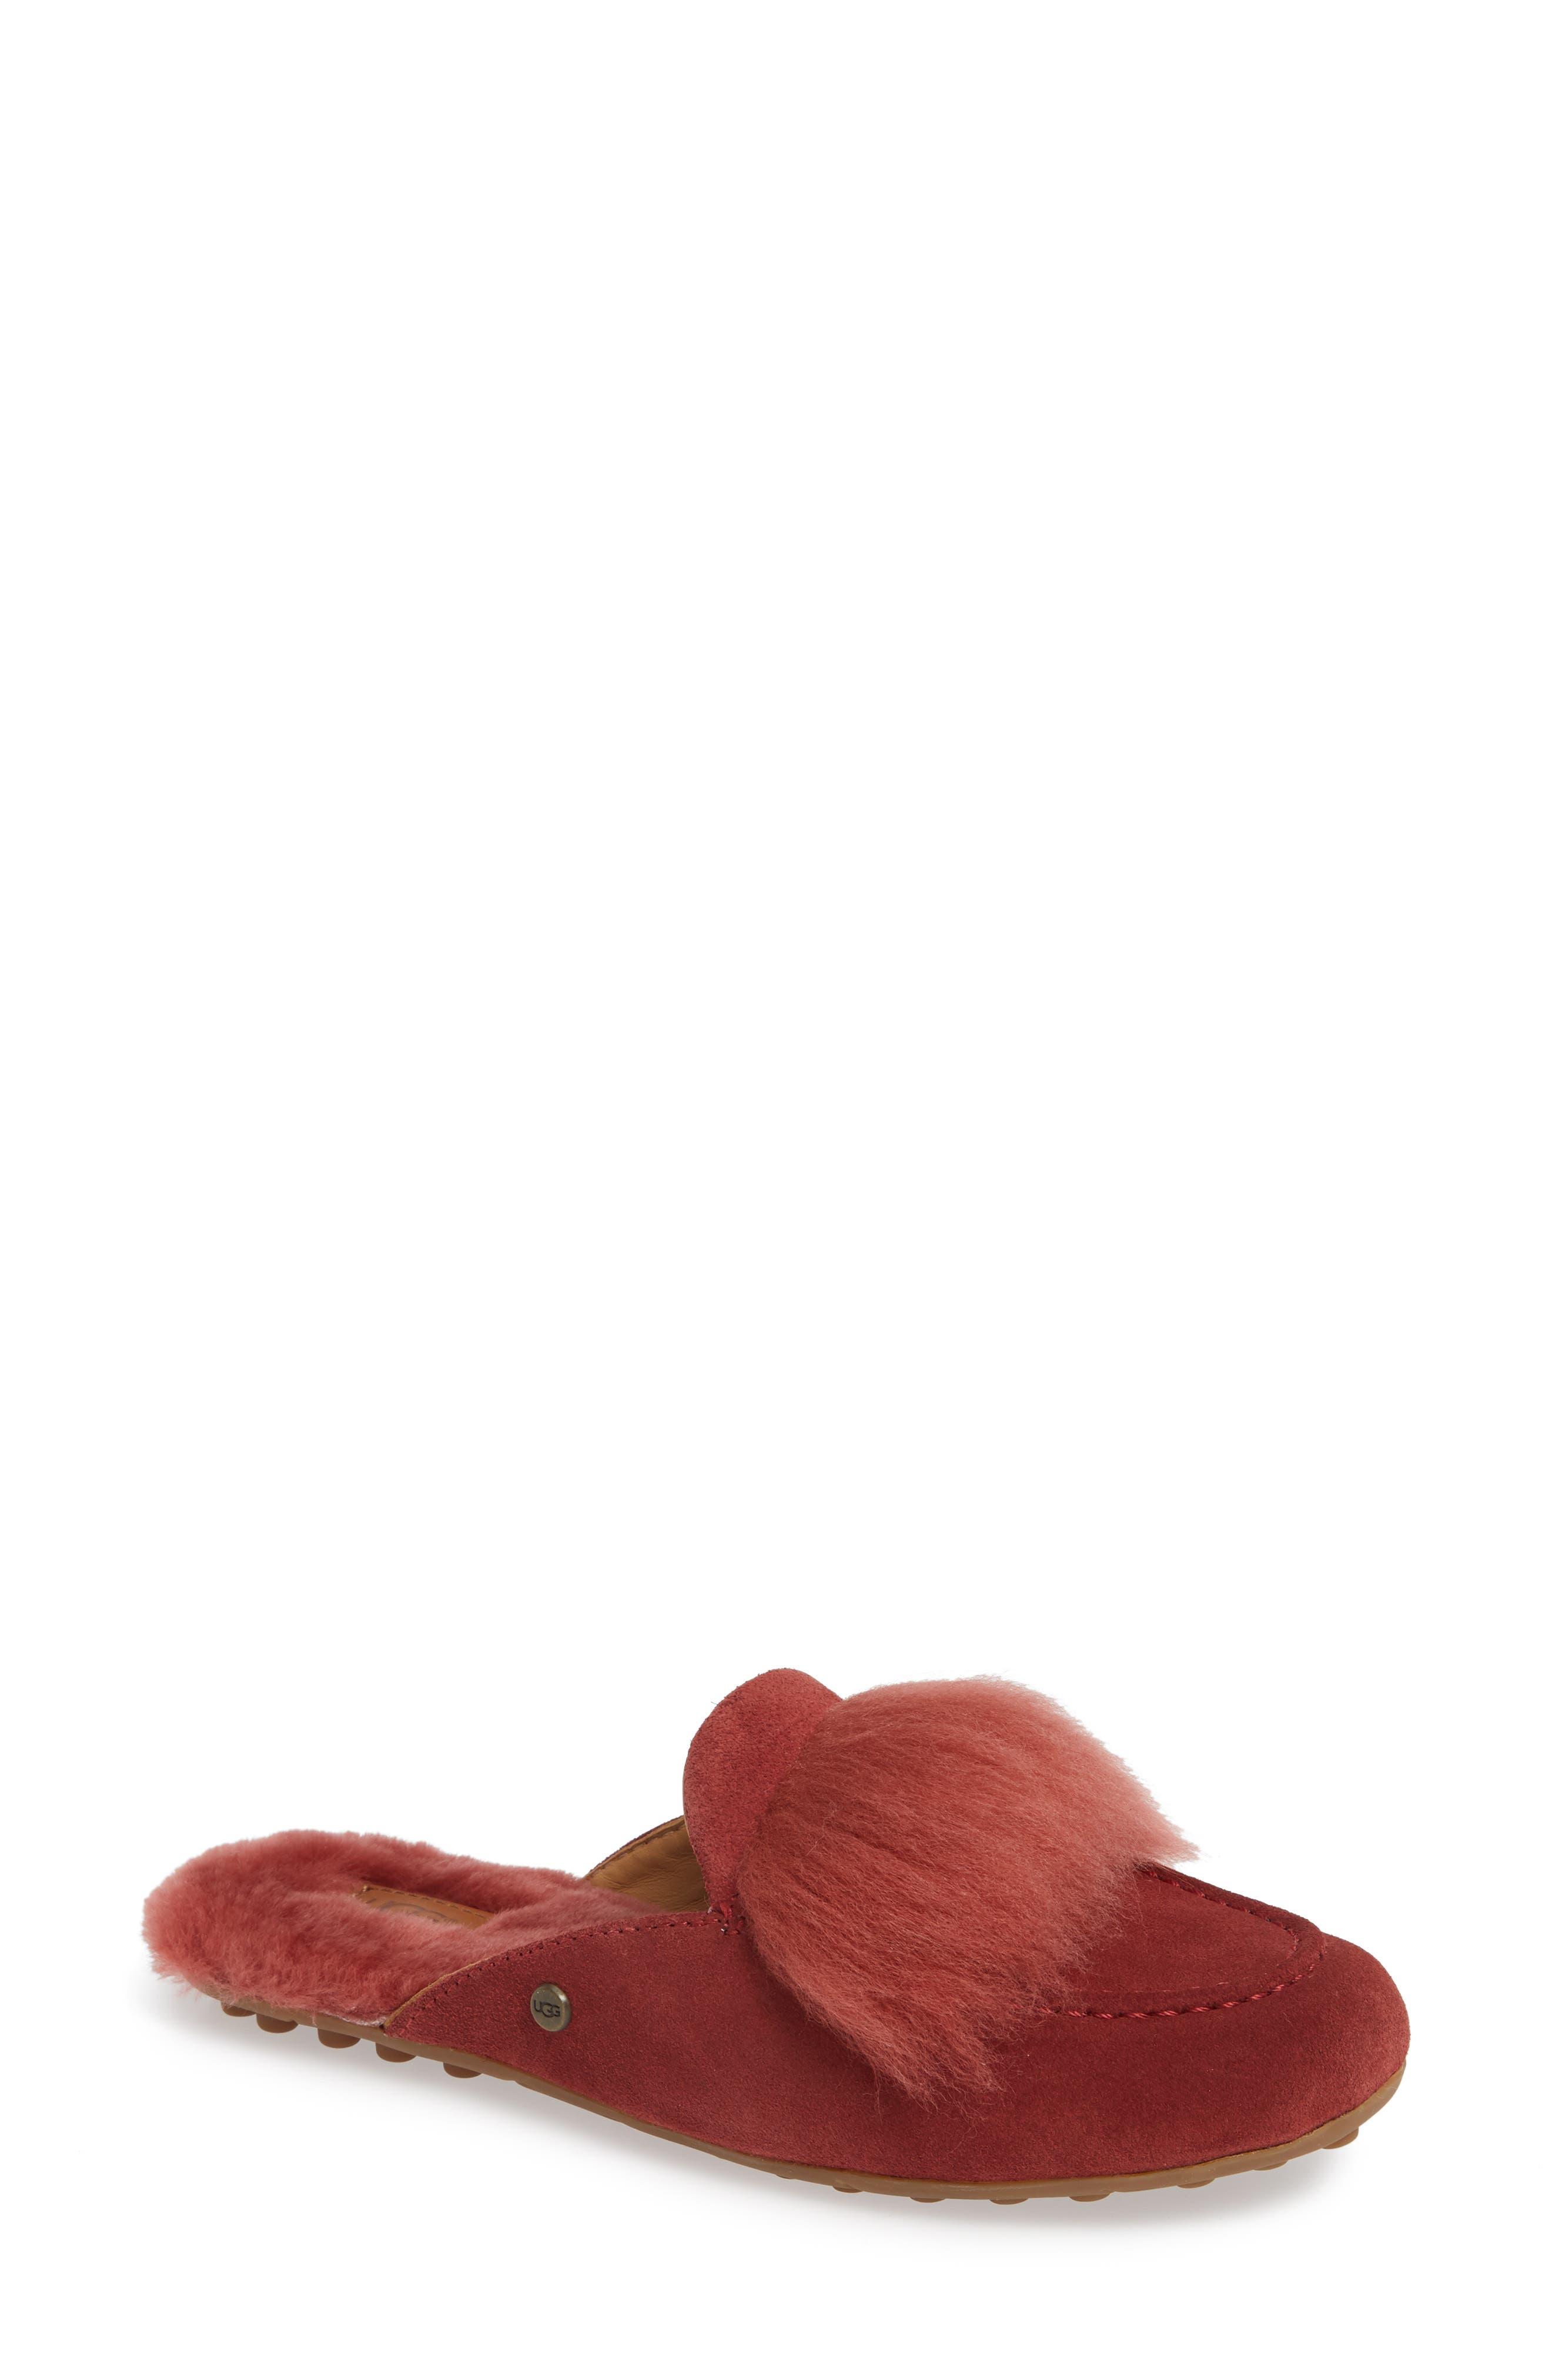 Ugg Shaine Wisp Genuine Shearling Slipper, Red